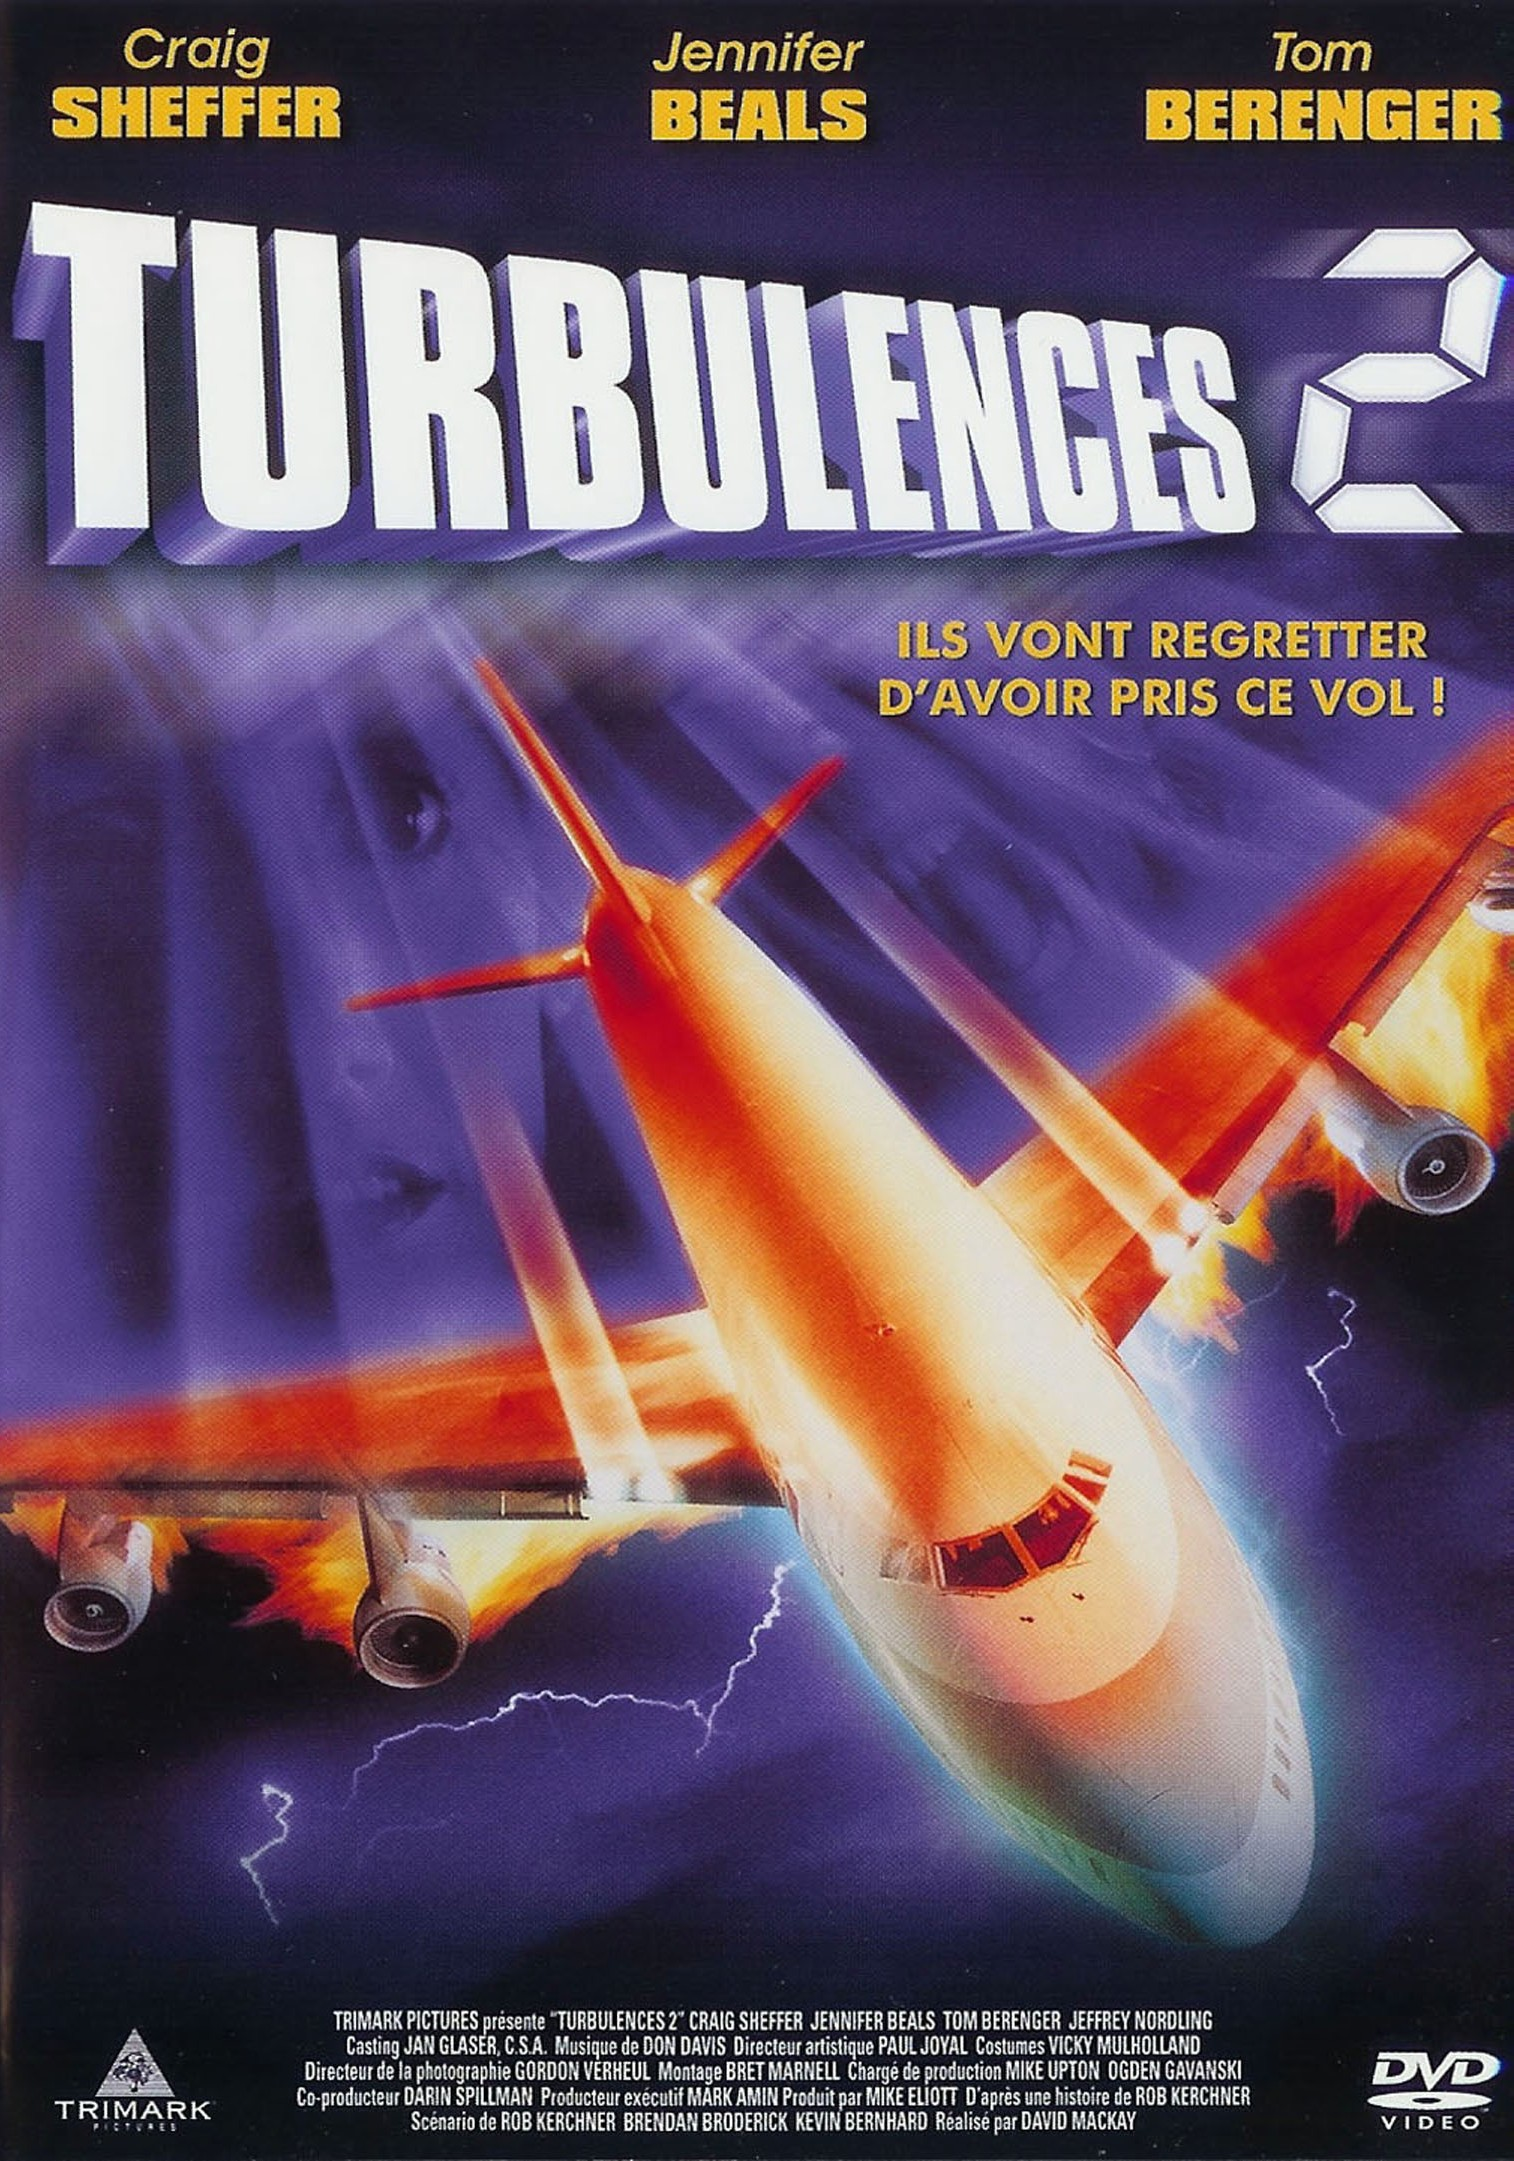 affiche du film Turbulences 2